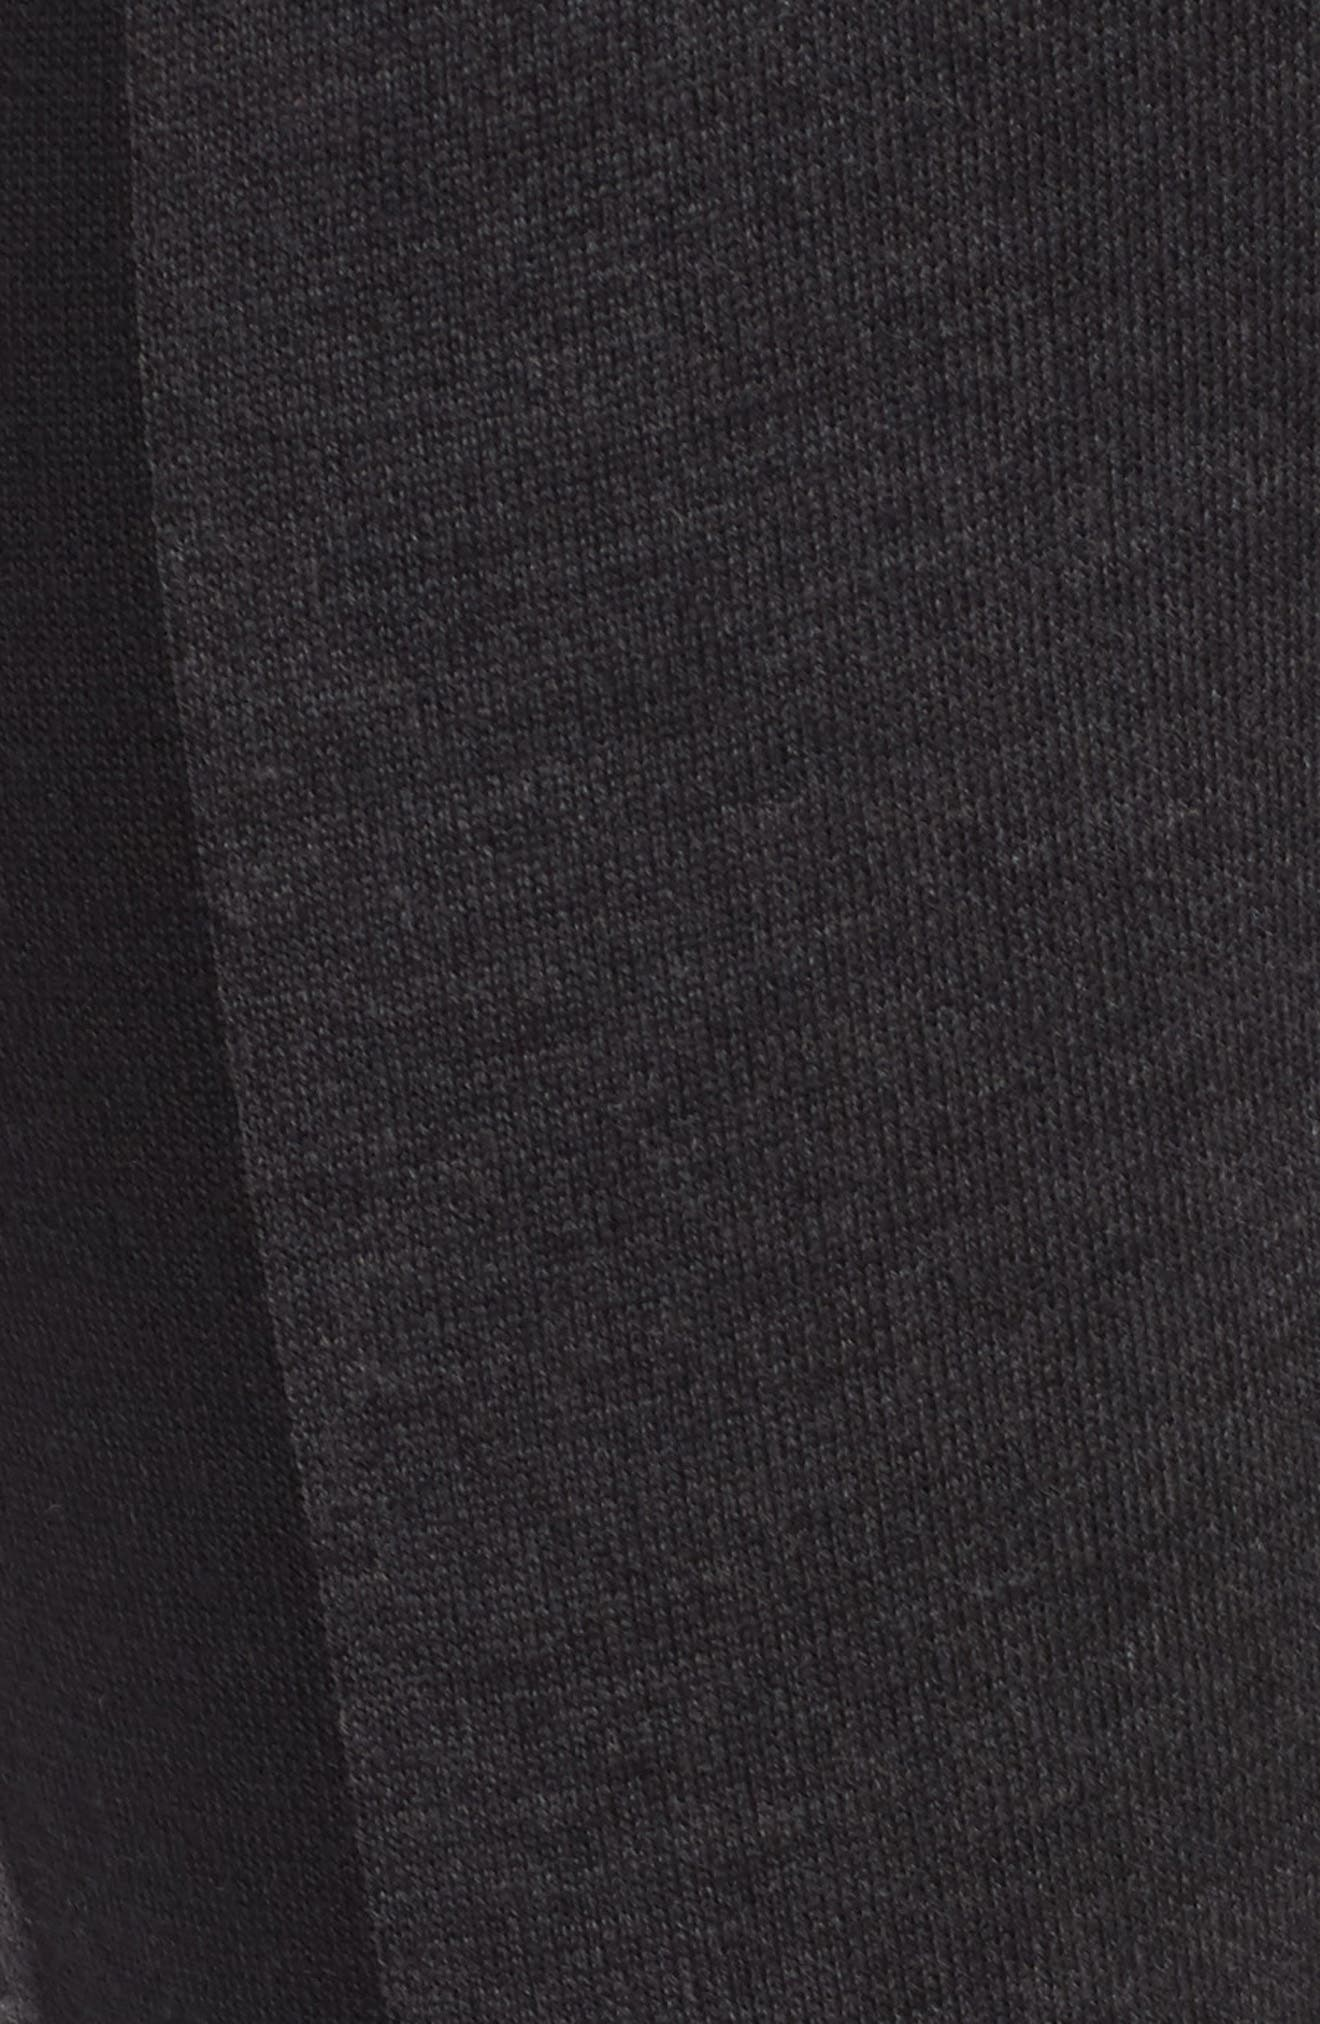 Colorblock Leggings,                             Alternate thumbnail 5, color,                             Charcoal Black